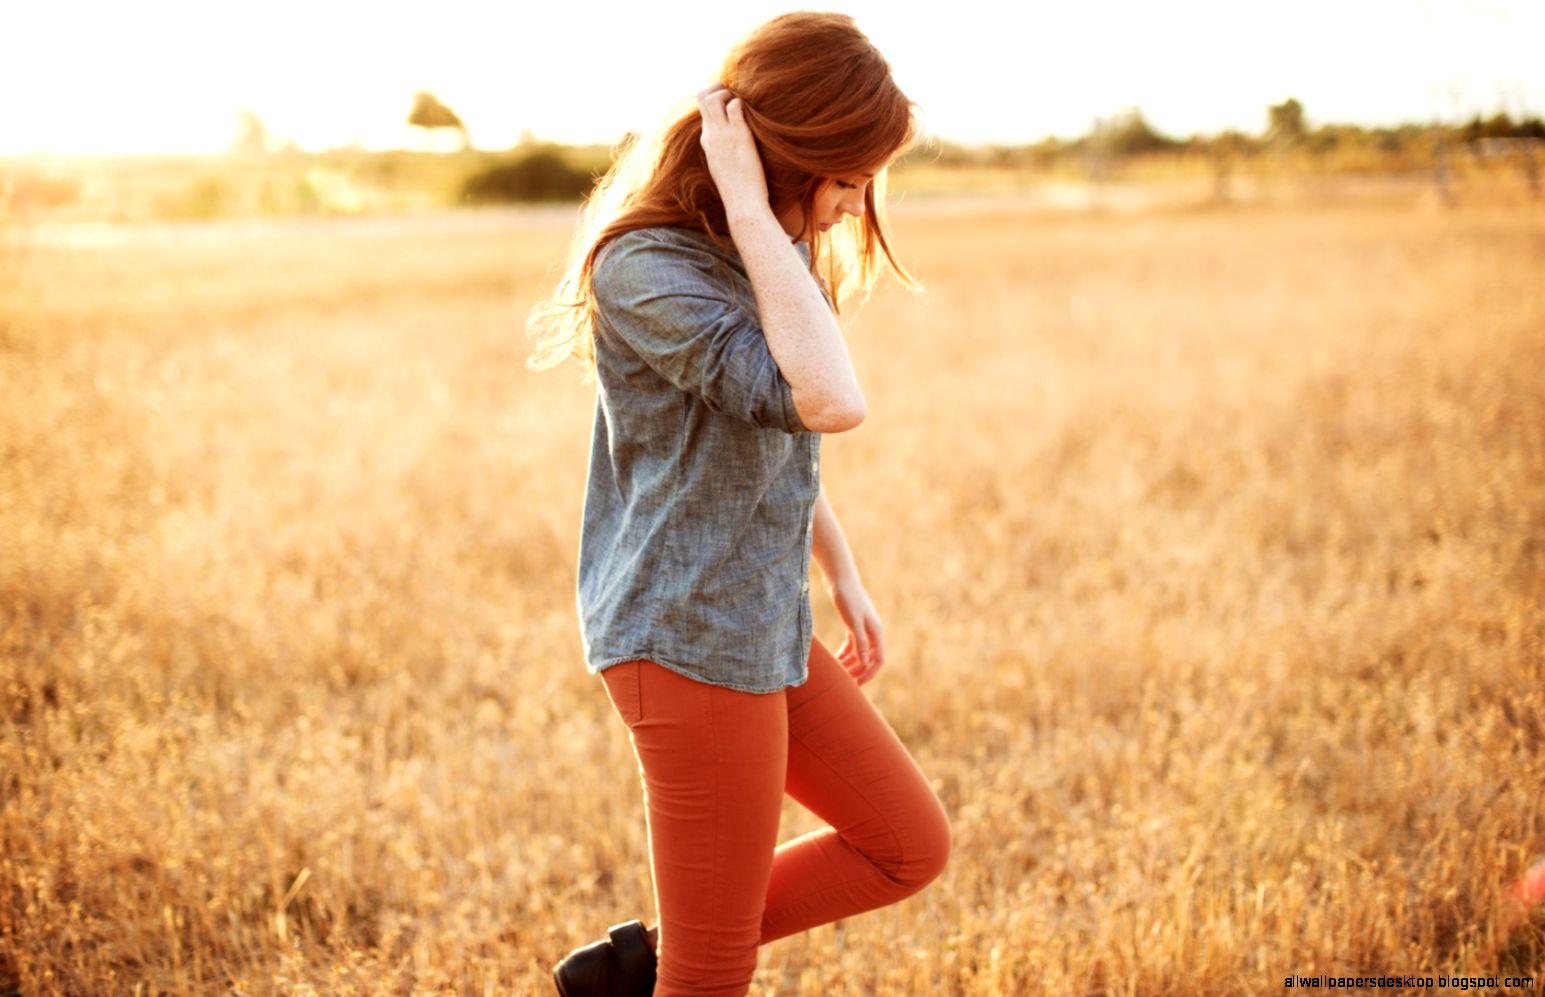 Field Redhead Girl 6963233